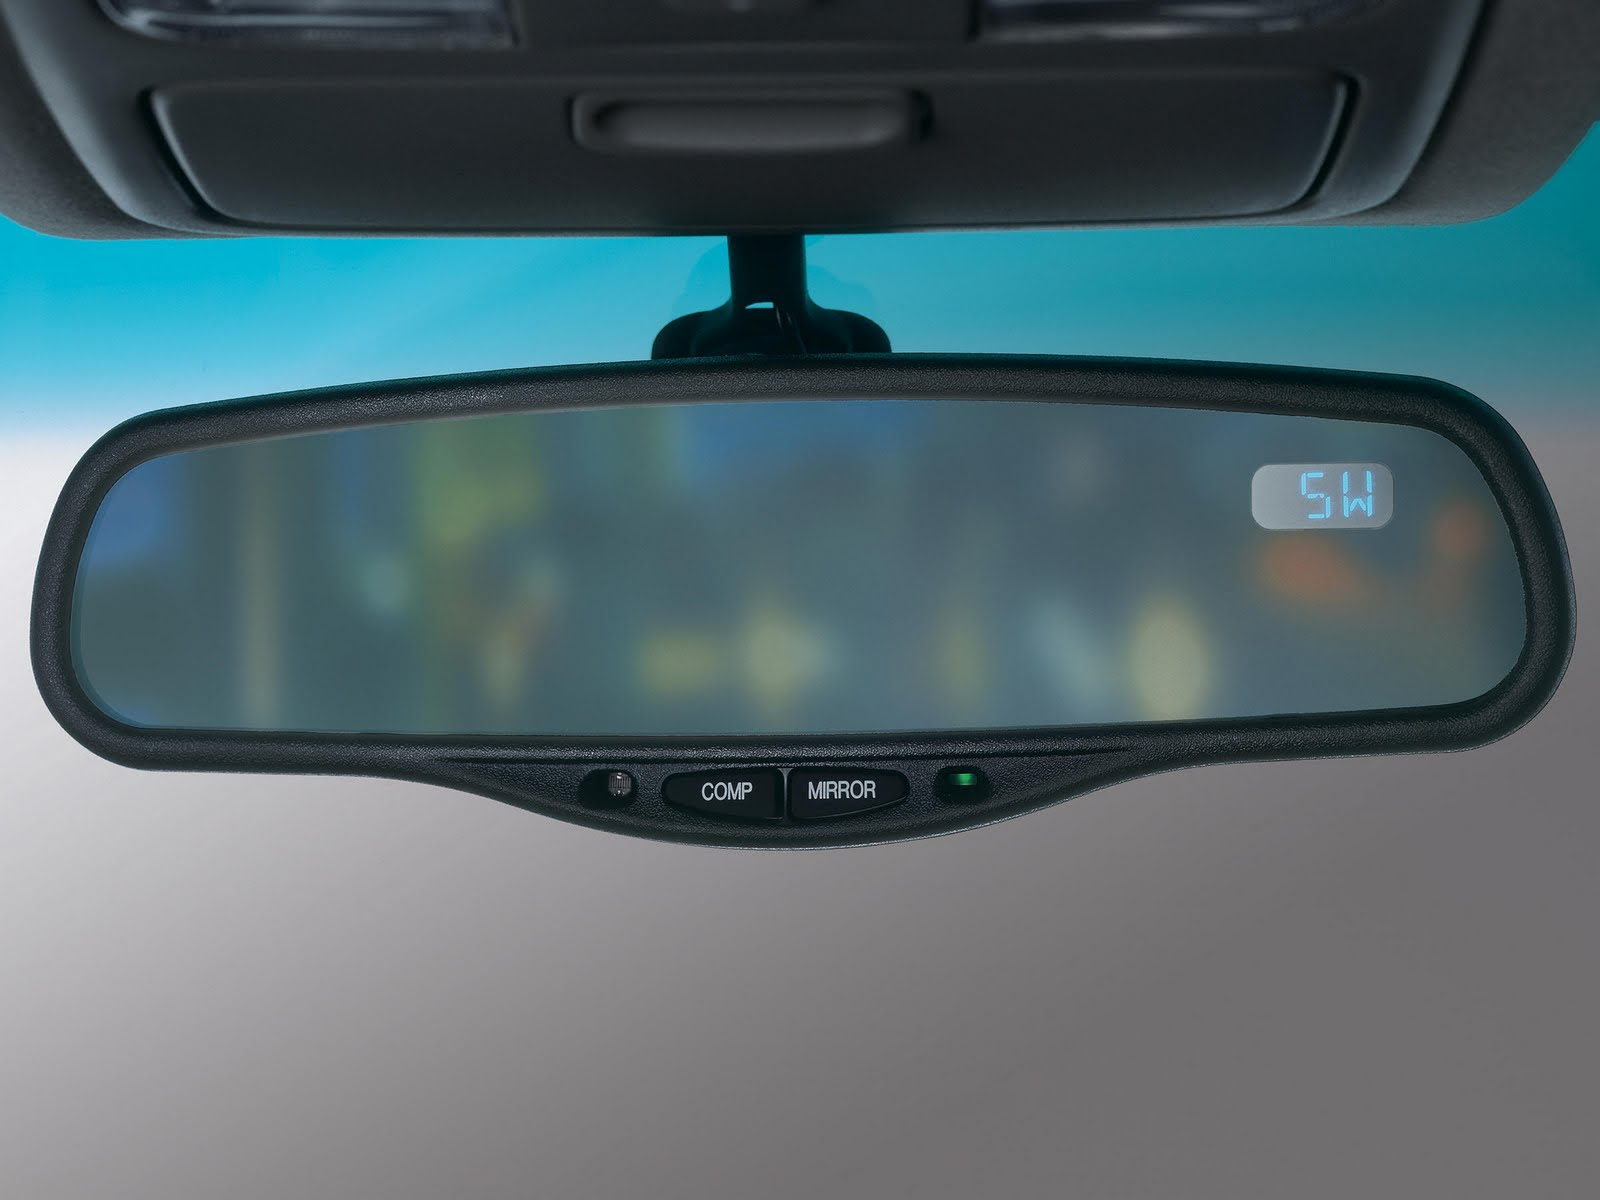 rear mirror rear view mirror rear mirror glue car rear mirror. Black Bedroom Furniture Sets. Home Design Ideas